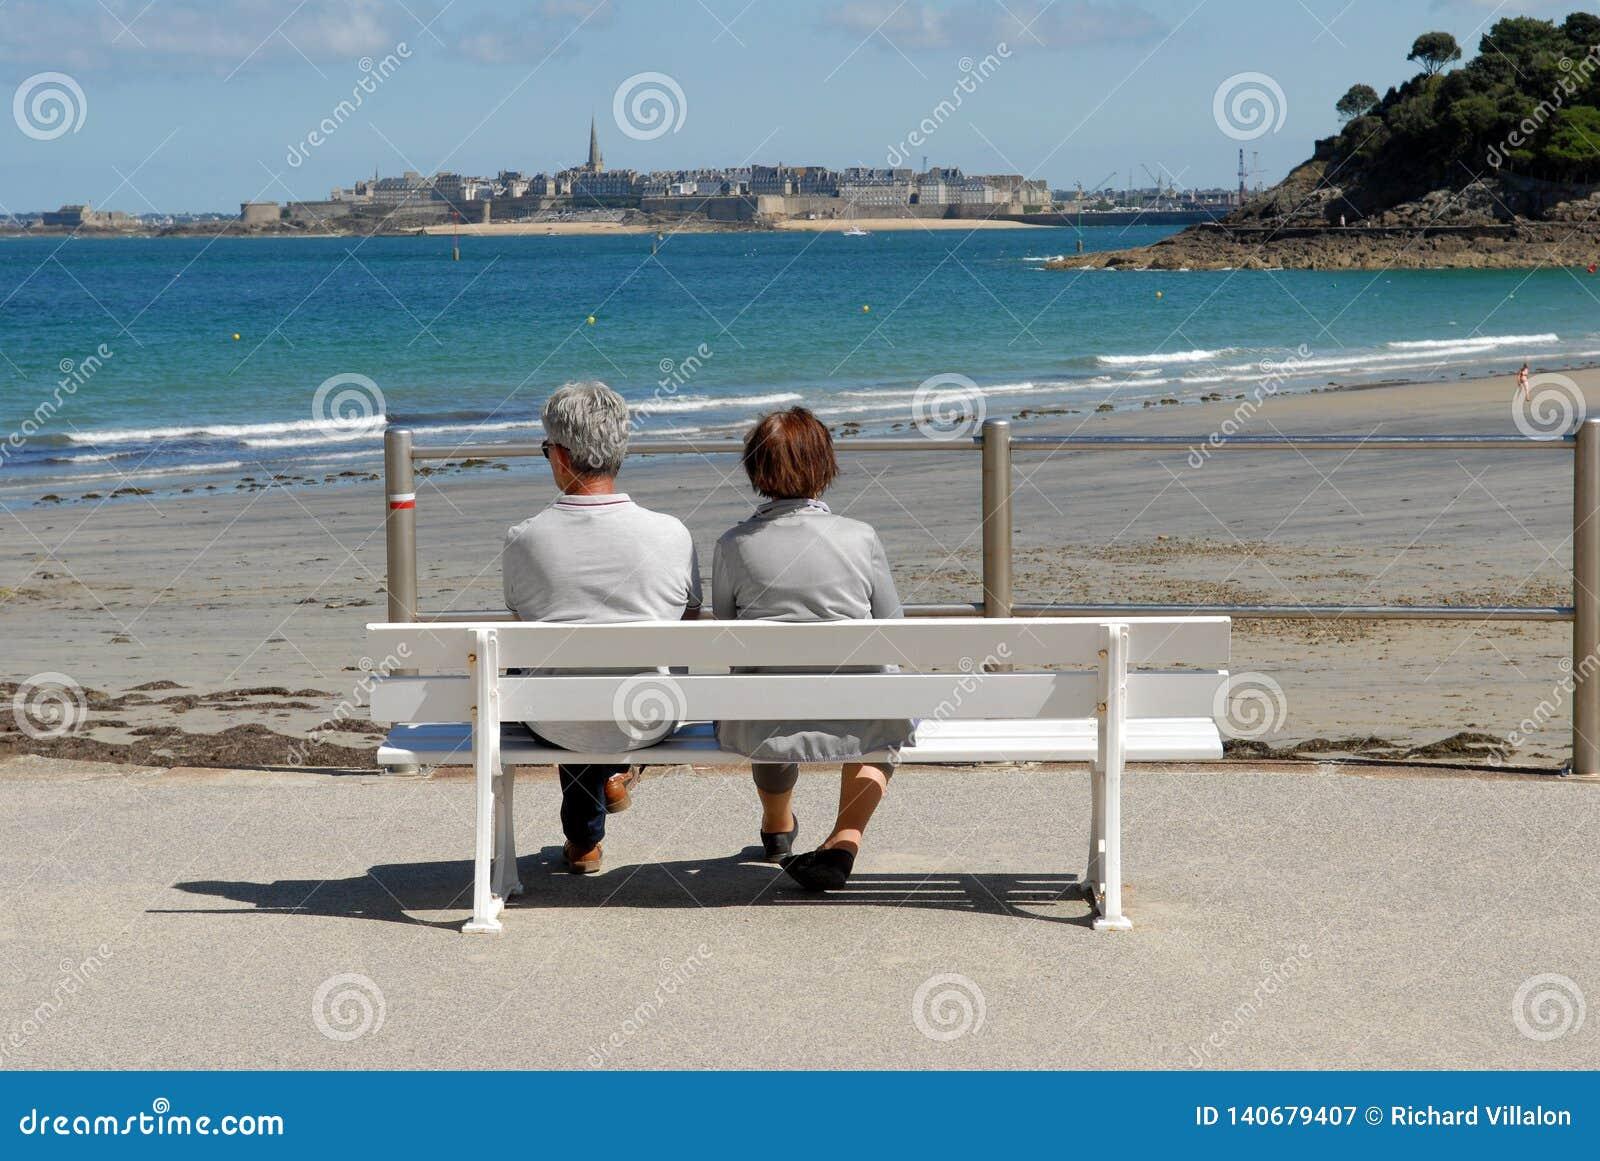 Couple on a bench facing Saint-Malo